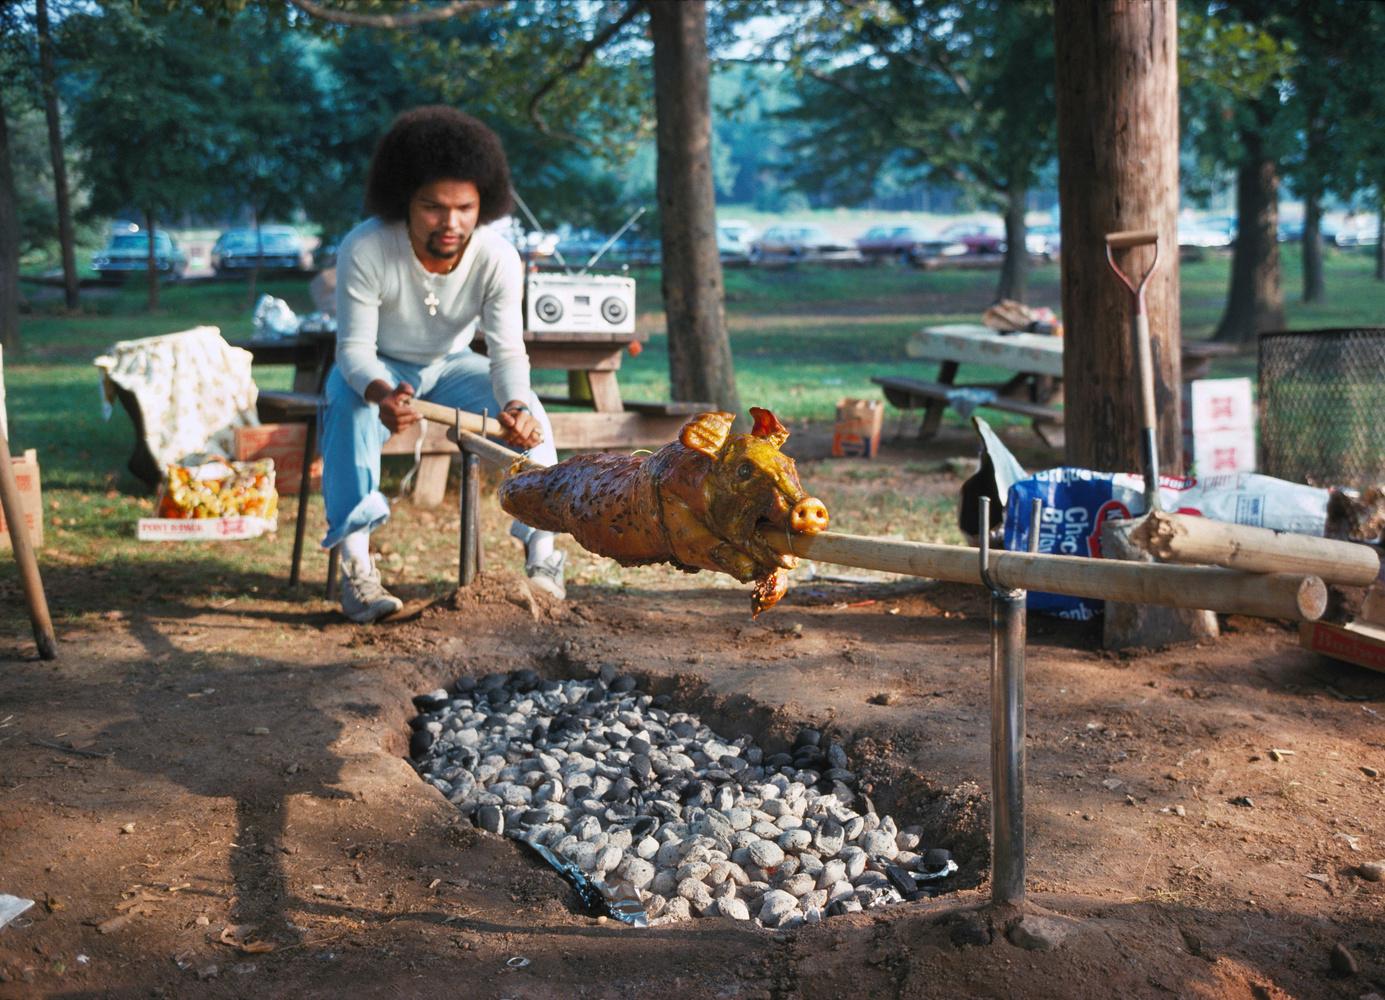 Neal Boenzi pork in the park